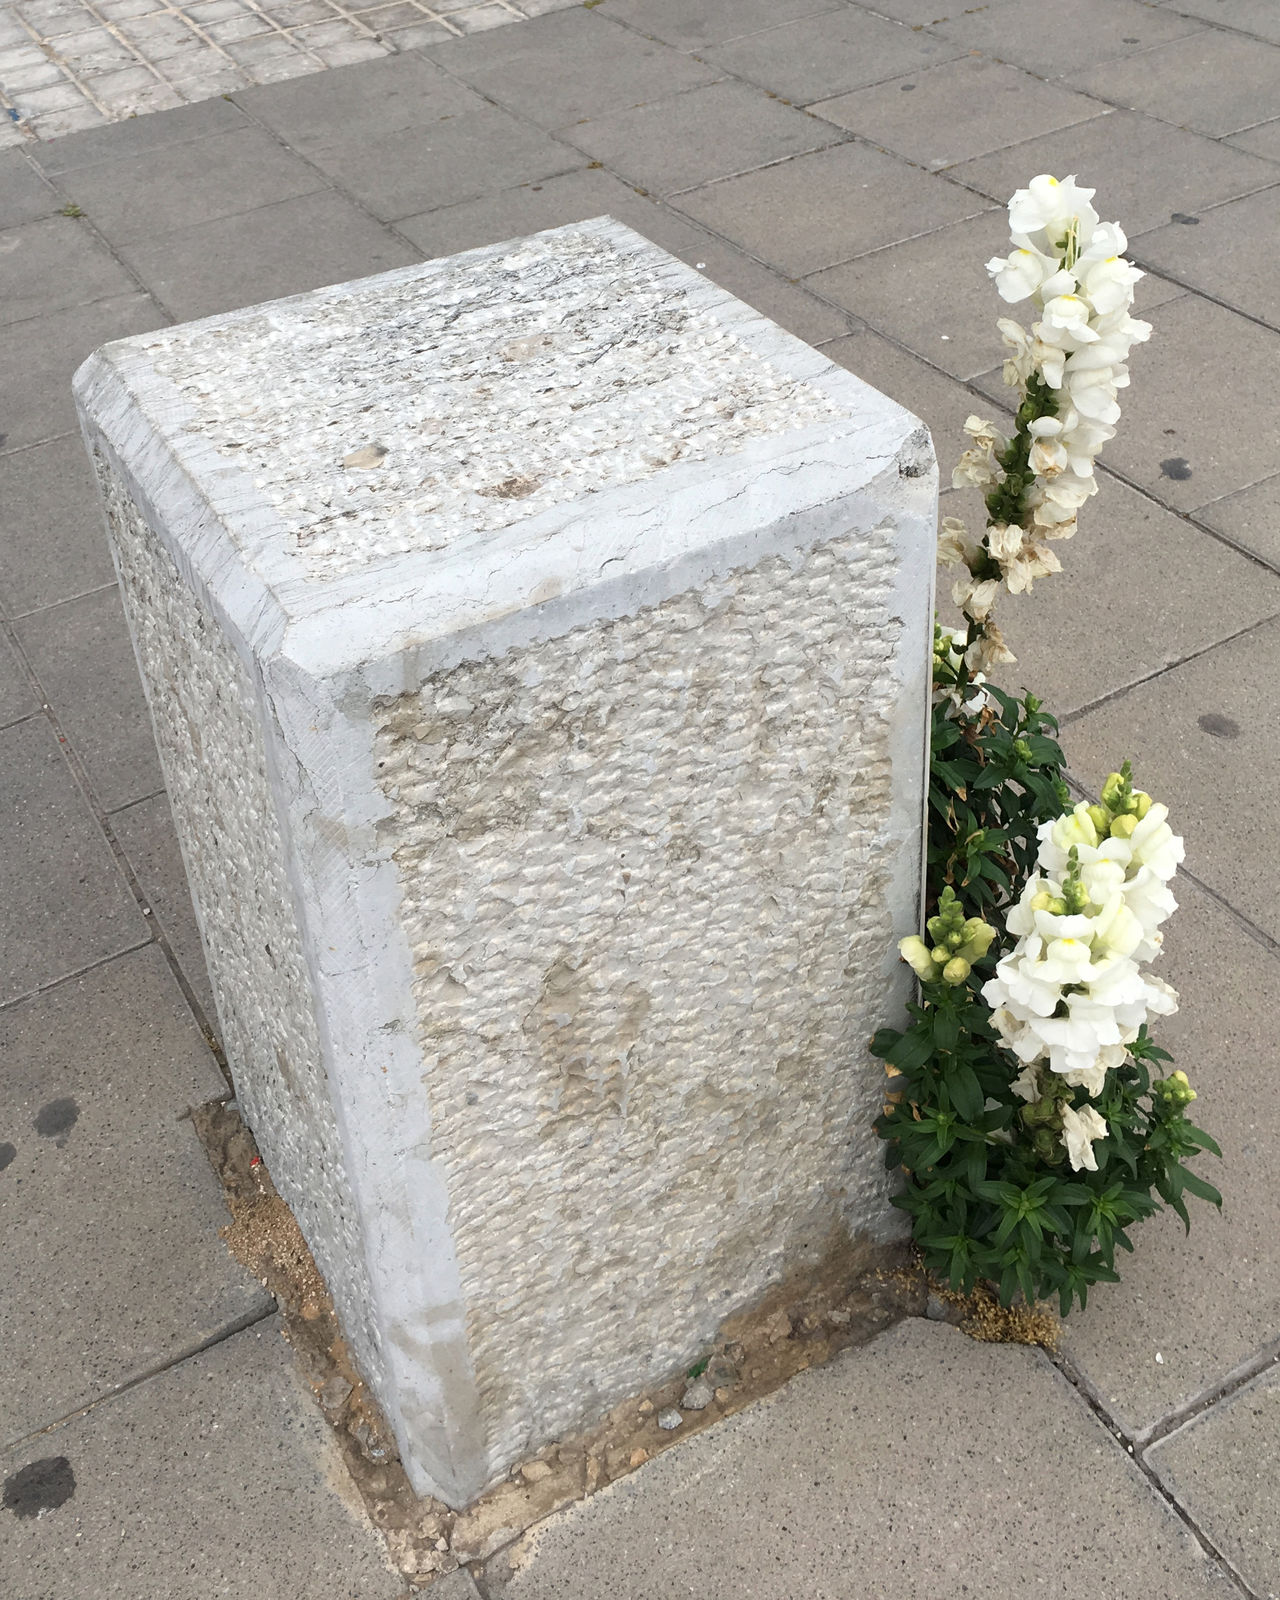 Bollard Concrete Flower Pavement Sidewalk Slab Weed